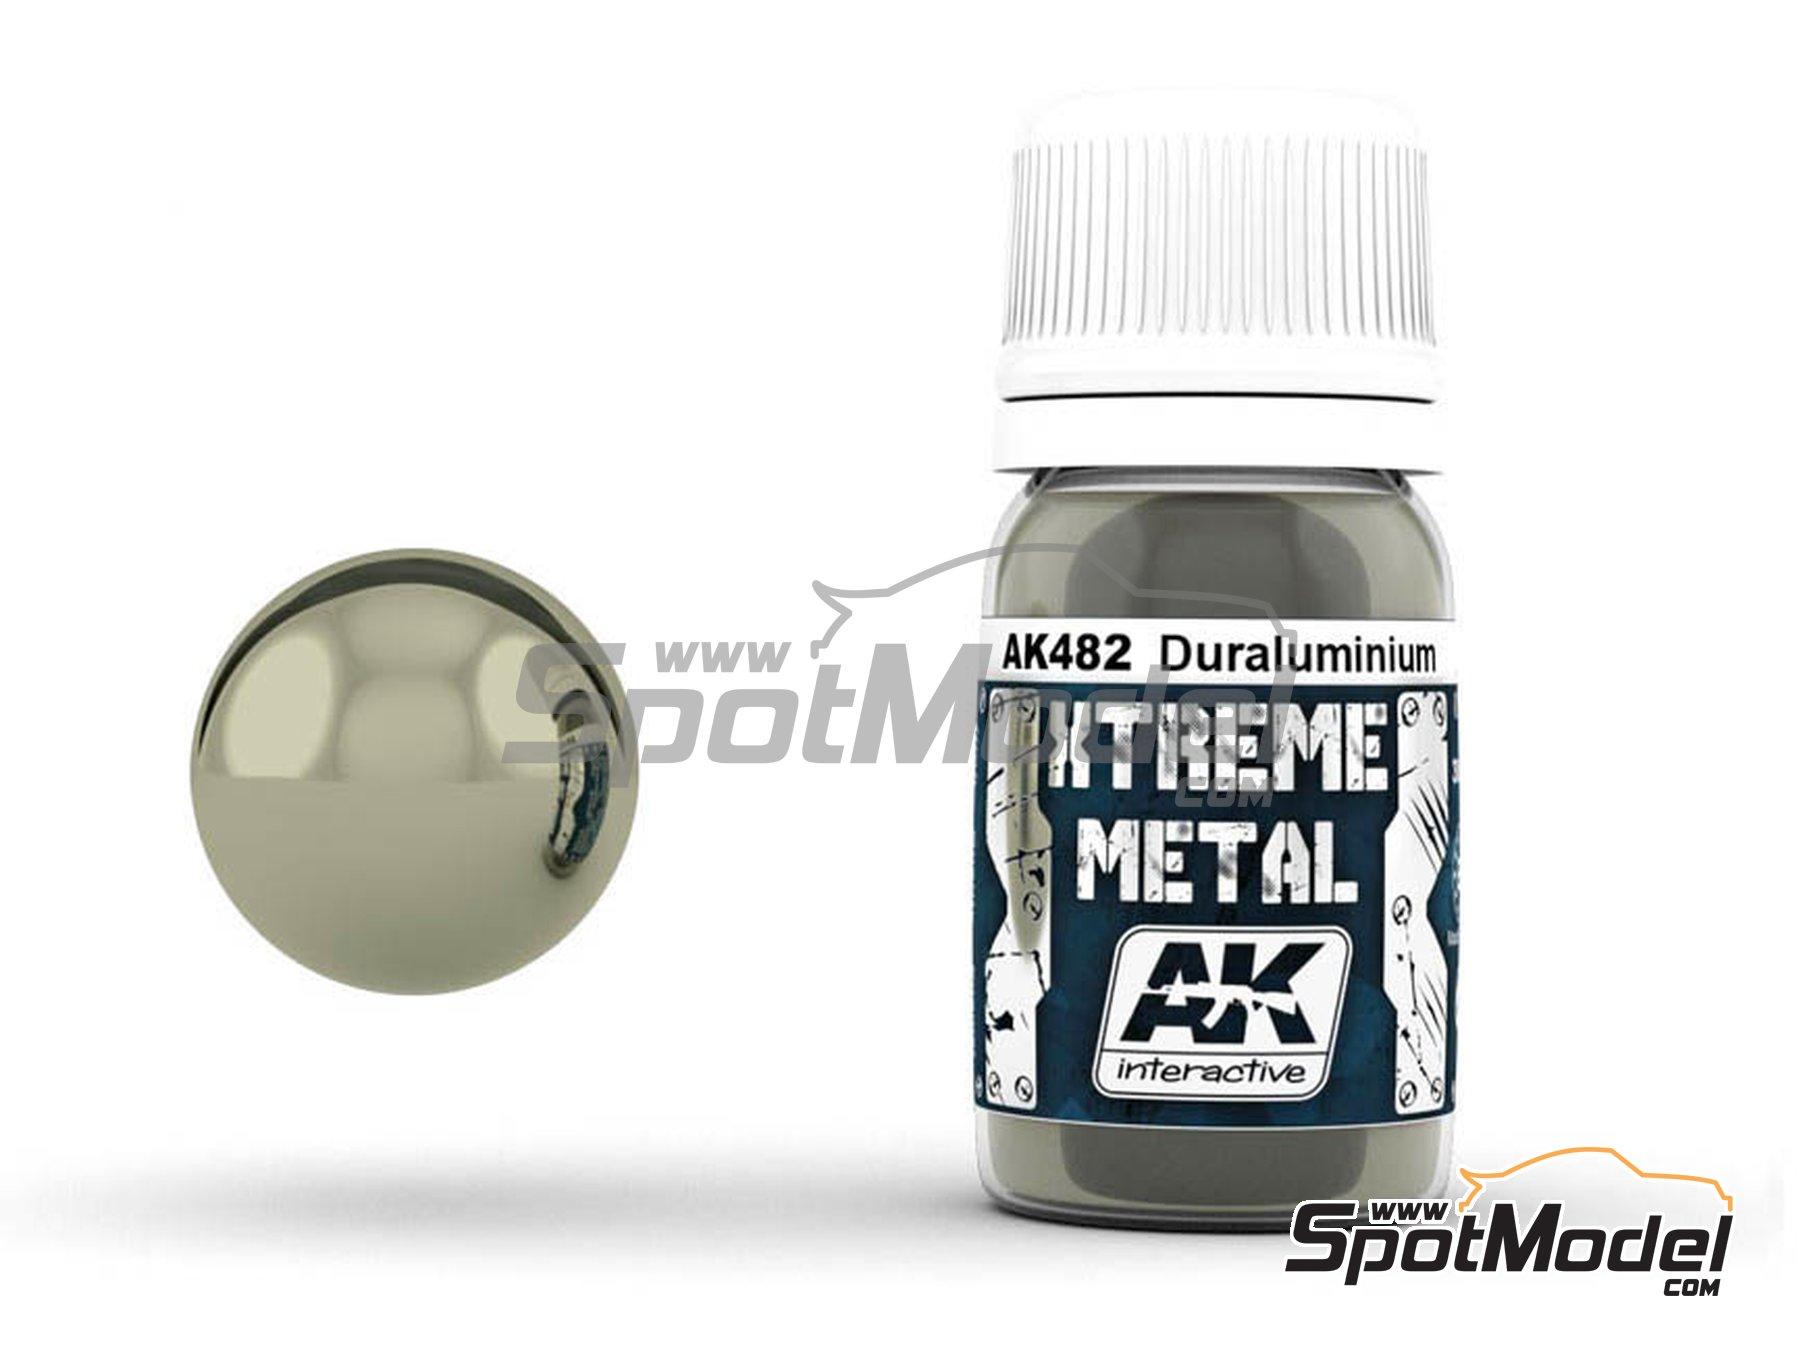 Image 1: Duraluminium | Xtreme metal paint manufactured by AK Interactive (ref.AK-482)